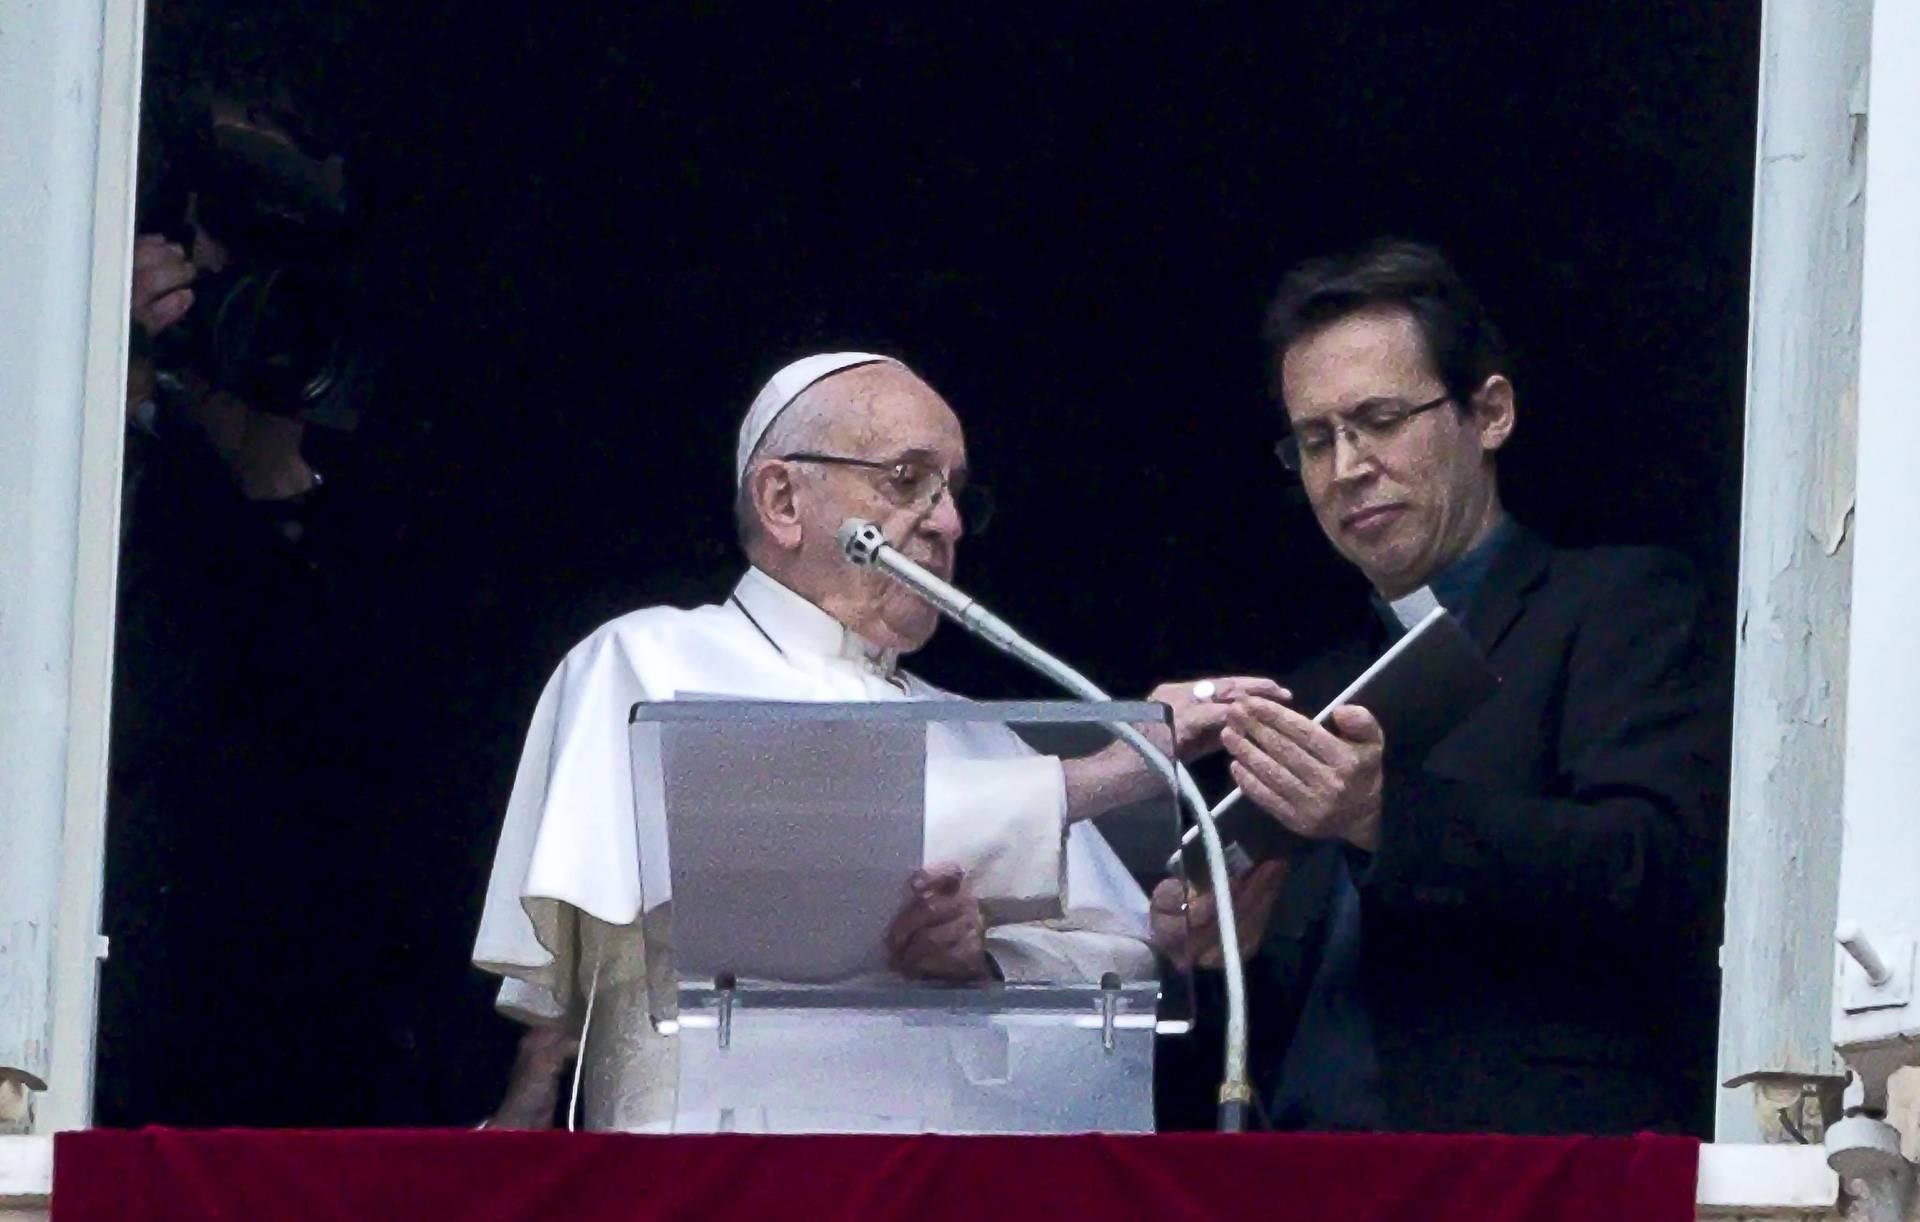 Папа Римский Франциск (слева) EPA-EFE/ANGELO CARCONI